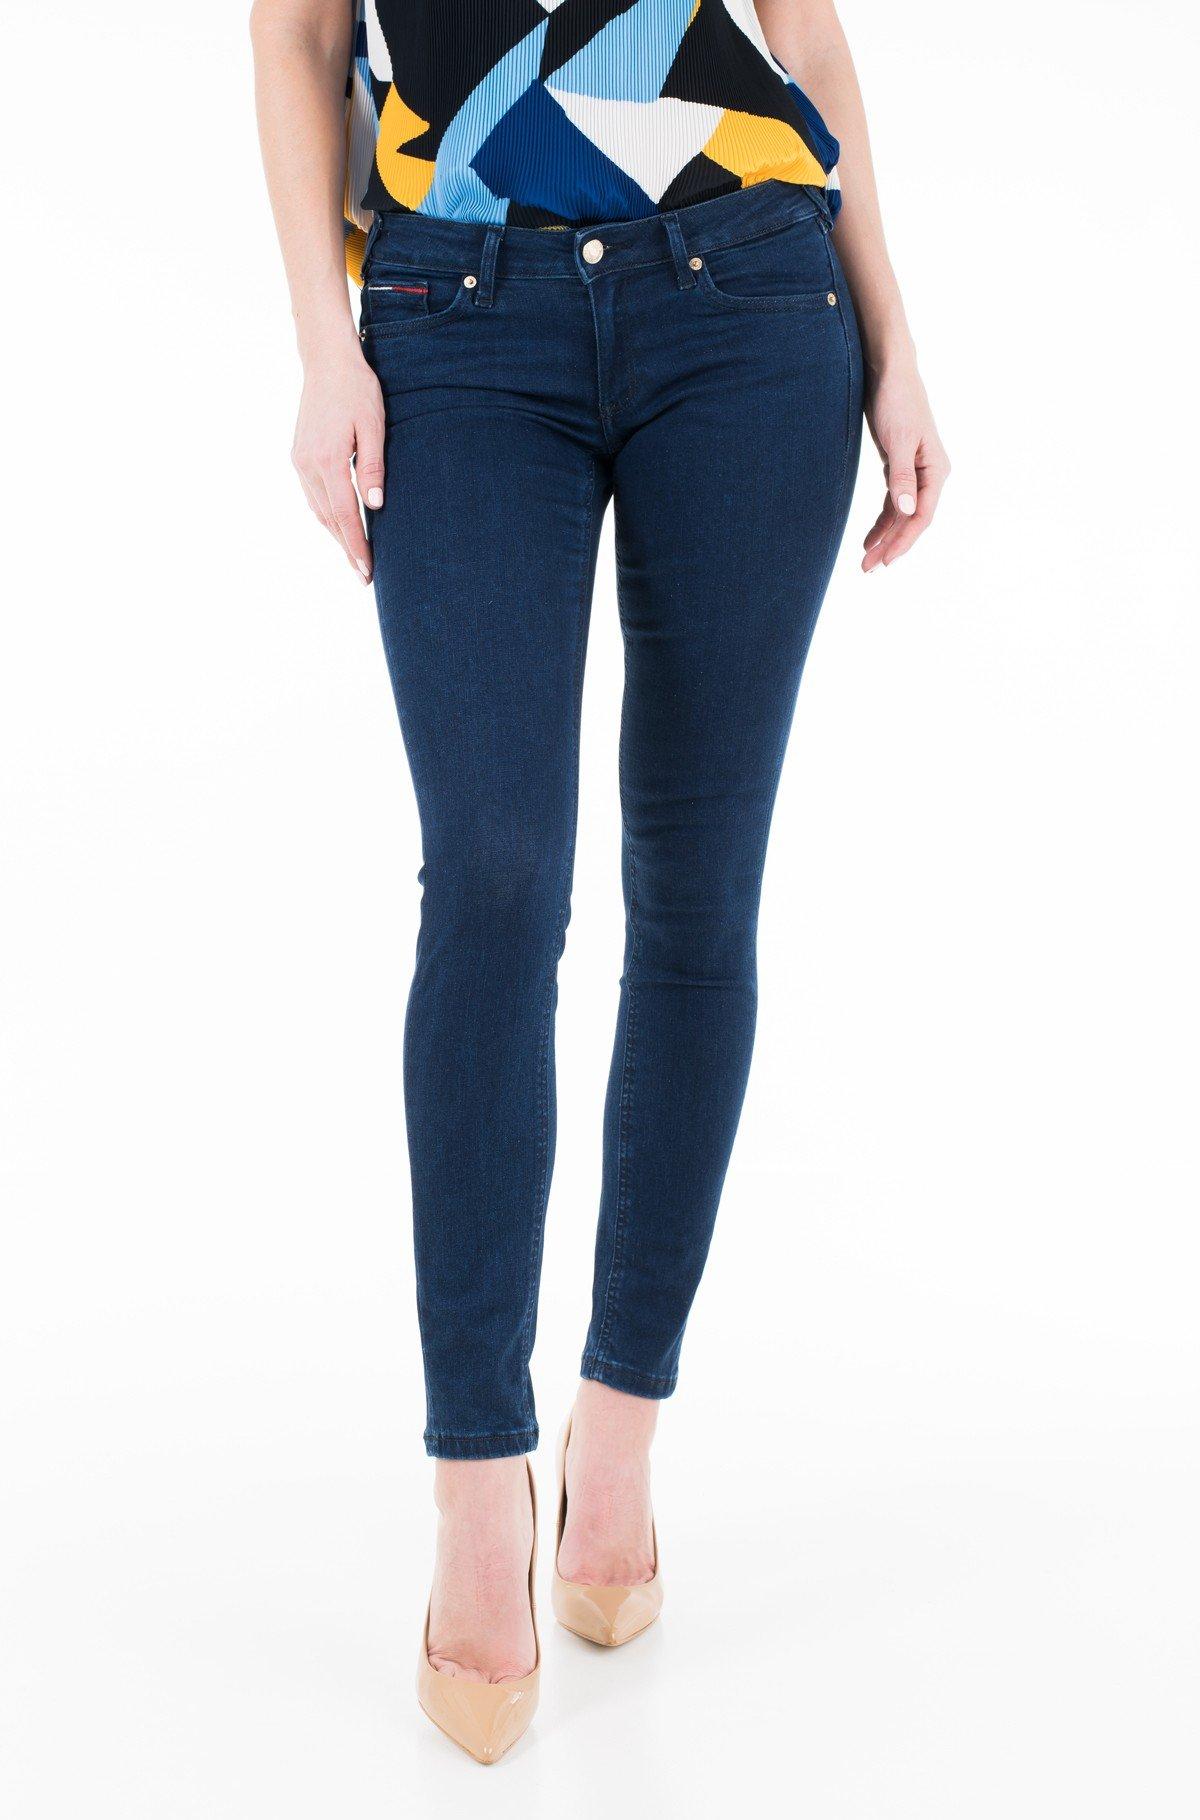 Jeans LOW RISE SKINNY SOPHIE PLSHDK-full-1